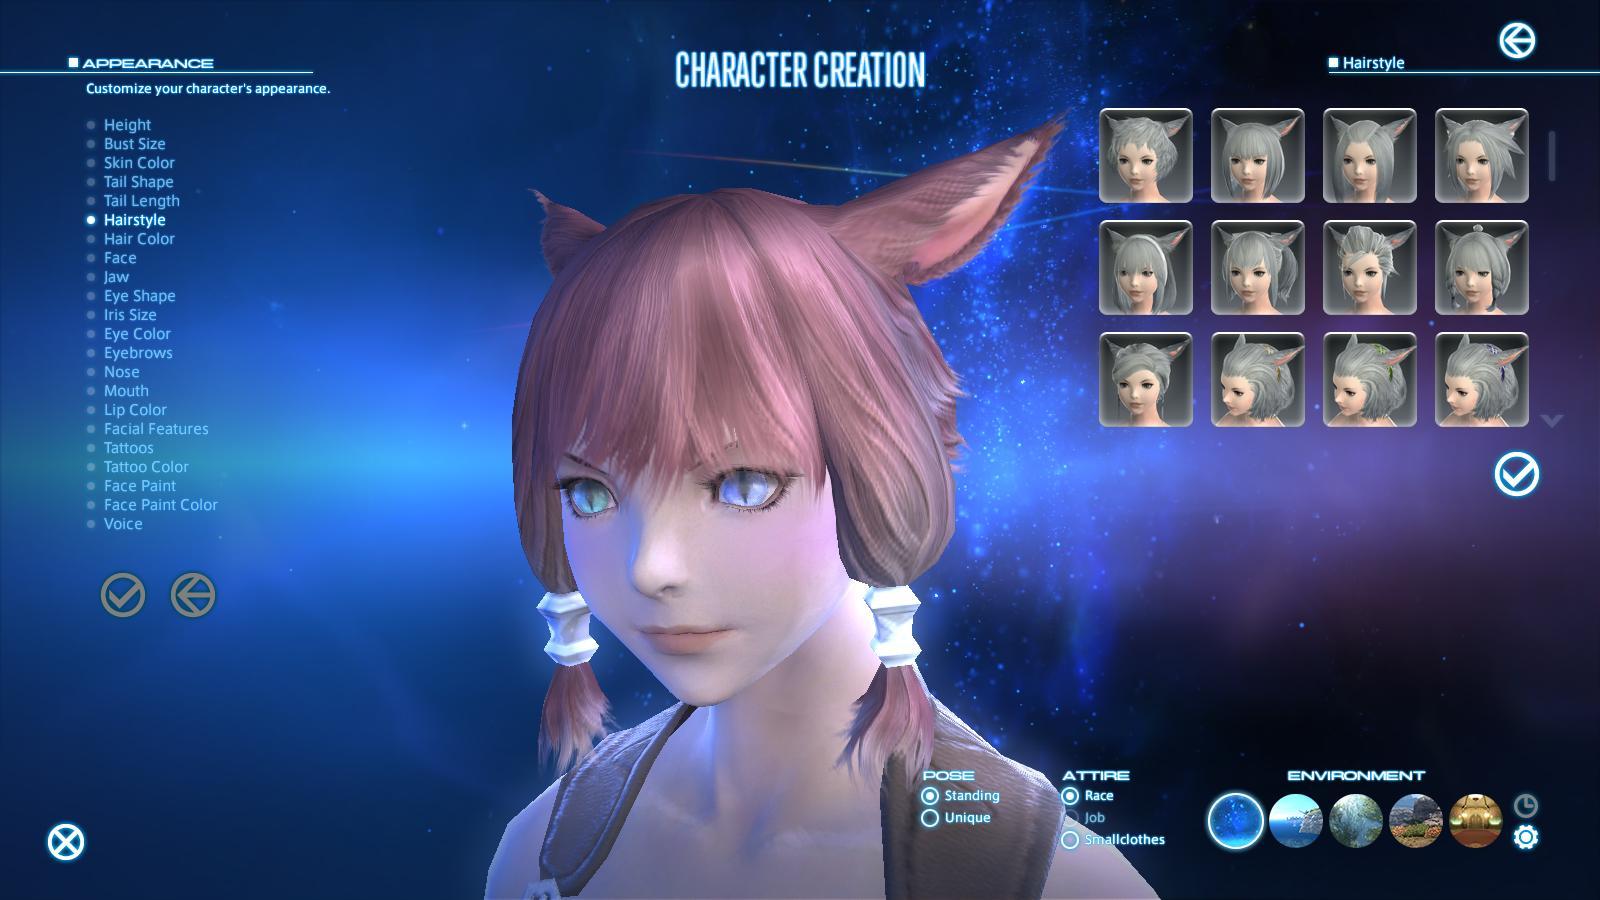 User blog:JAlbor/Final Fantasy XIV Beta Chronicles